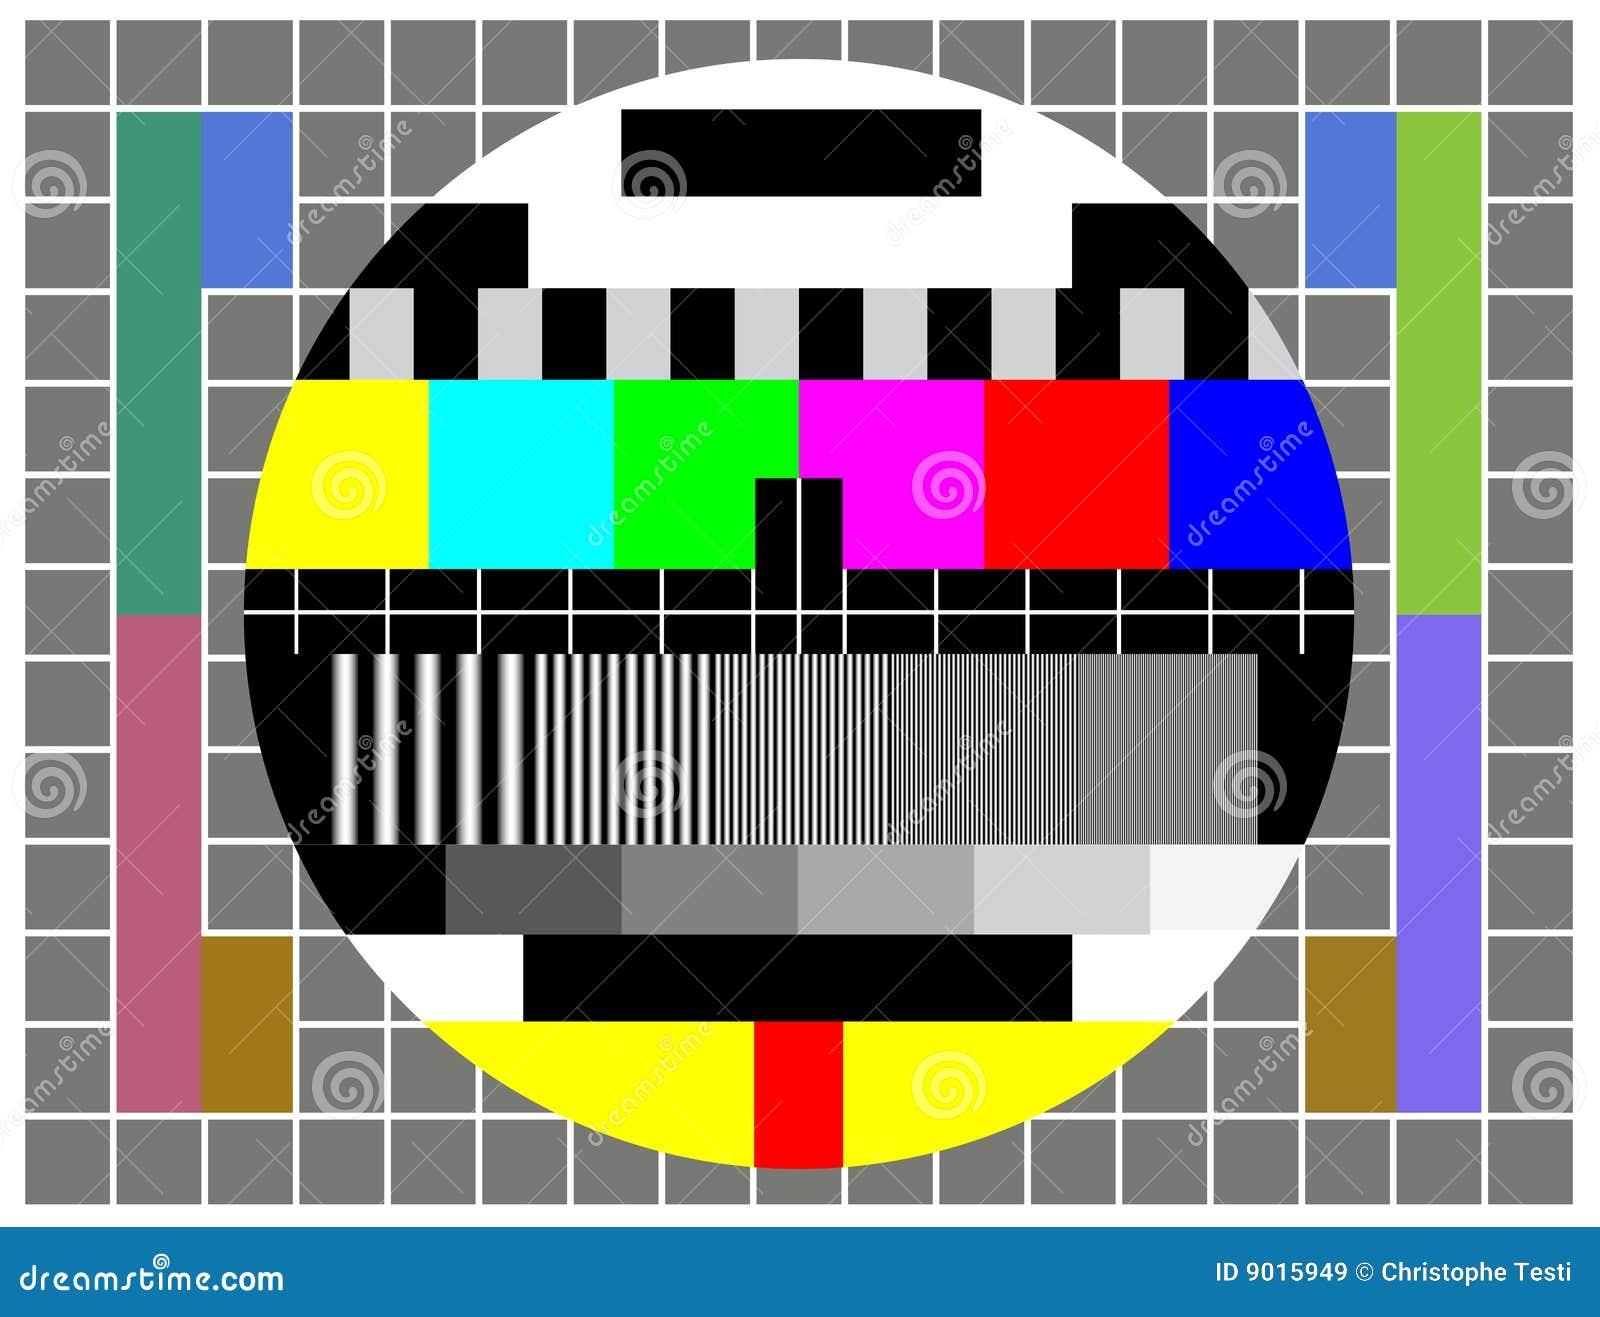 Test Tv